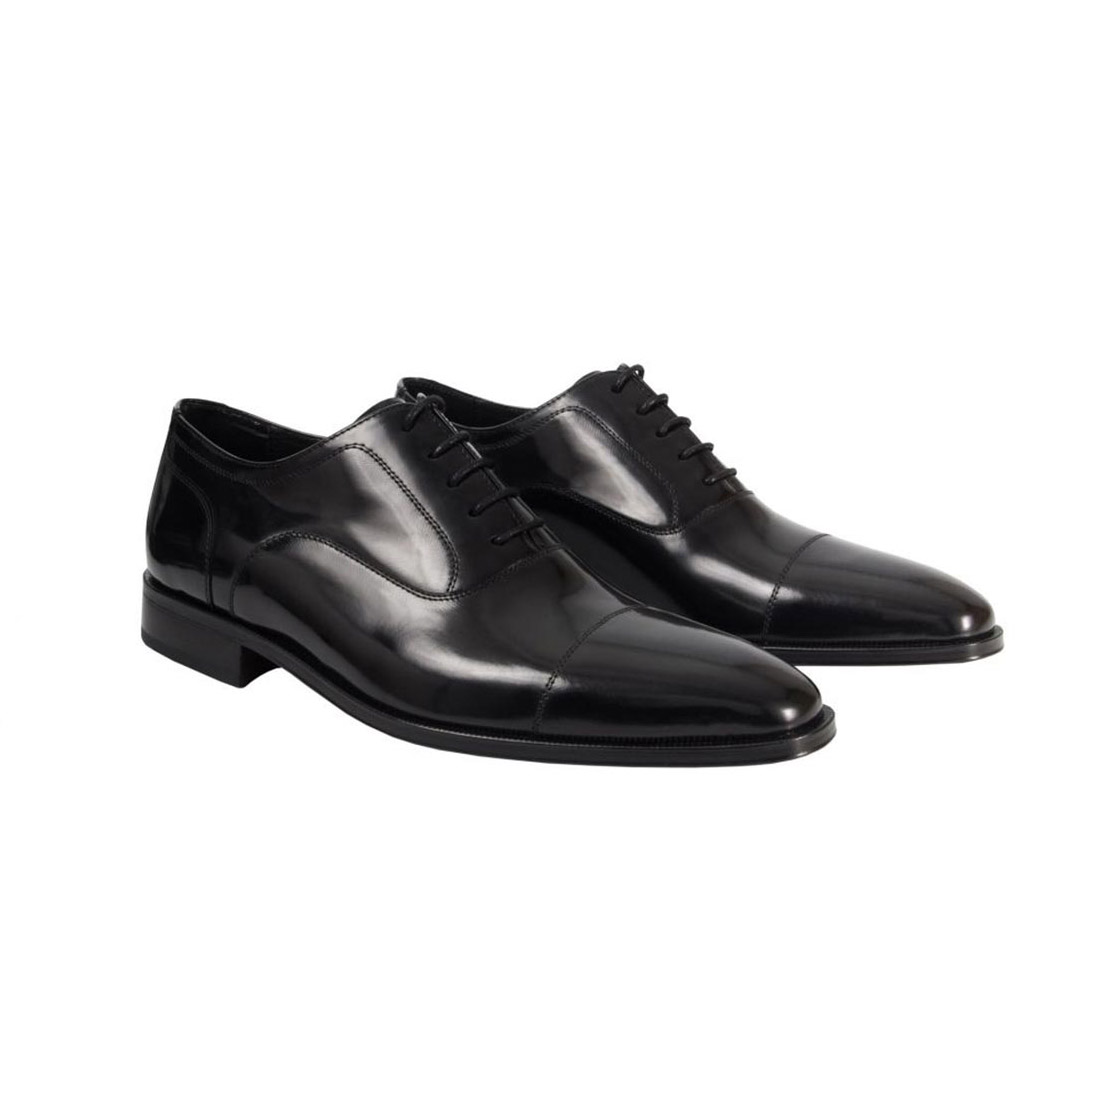 049-zapato-composition-e1564002906360